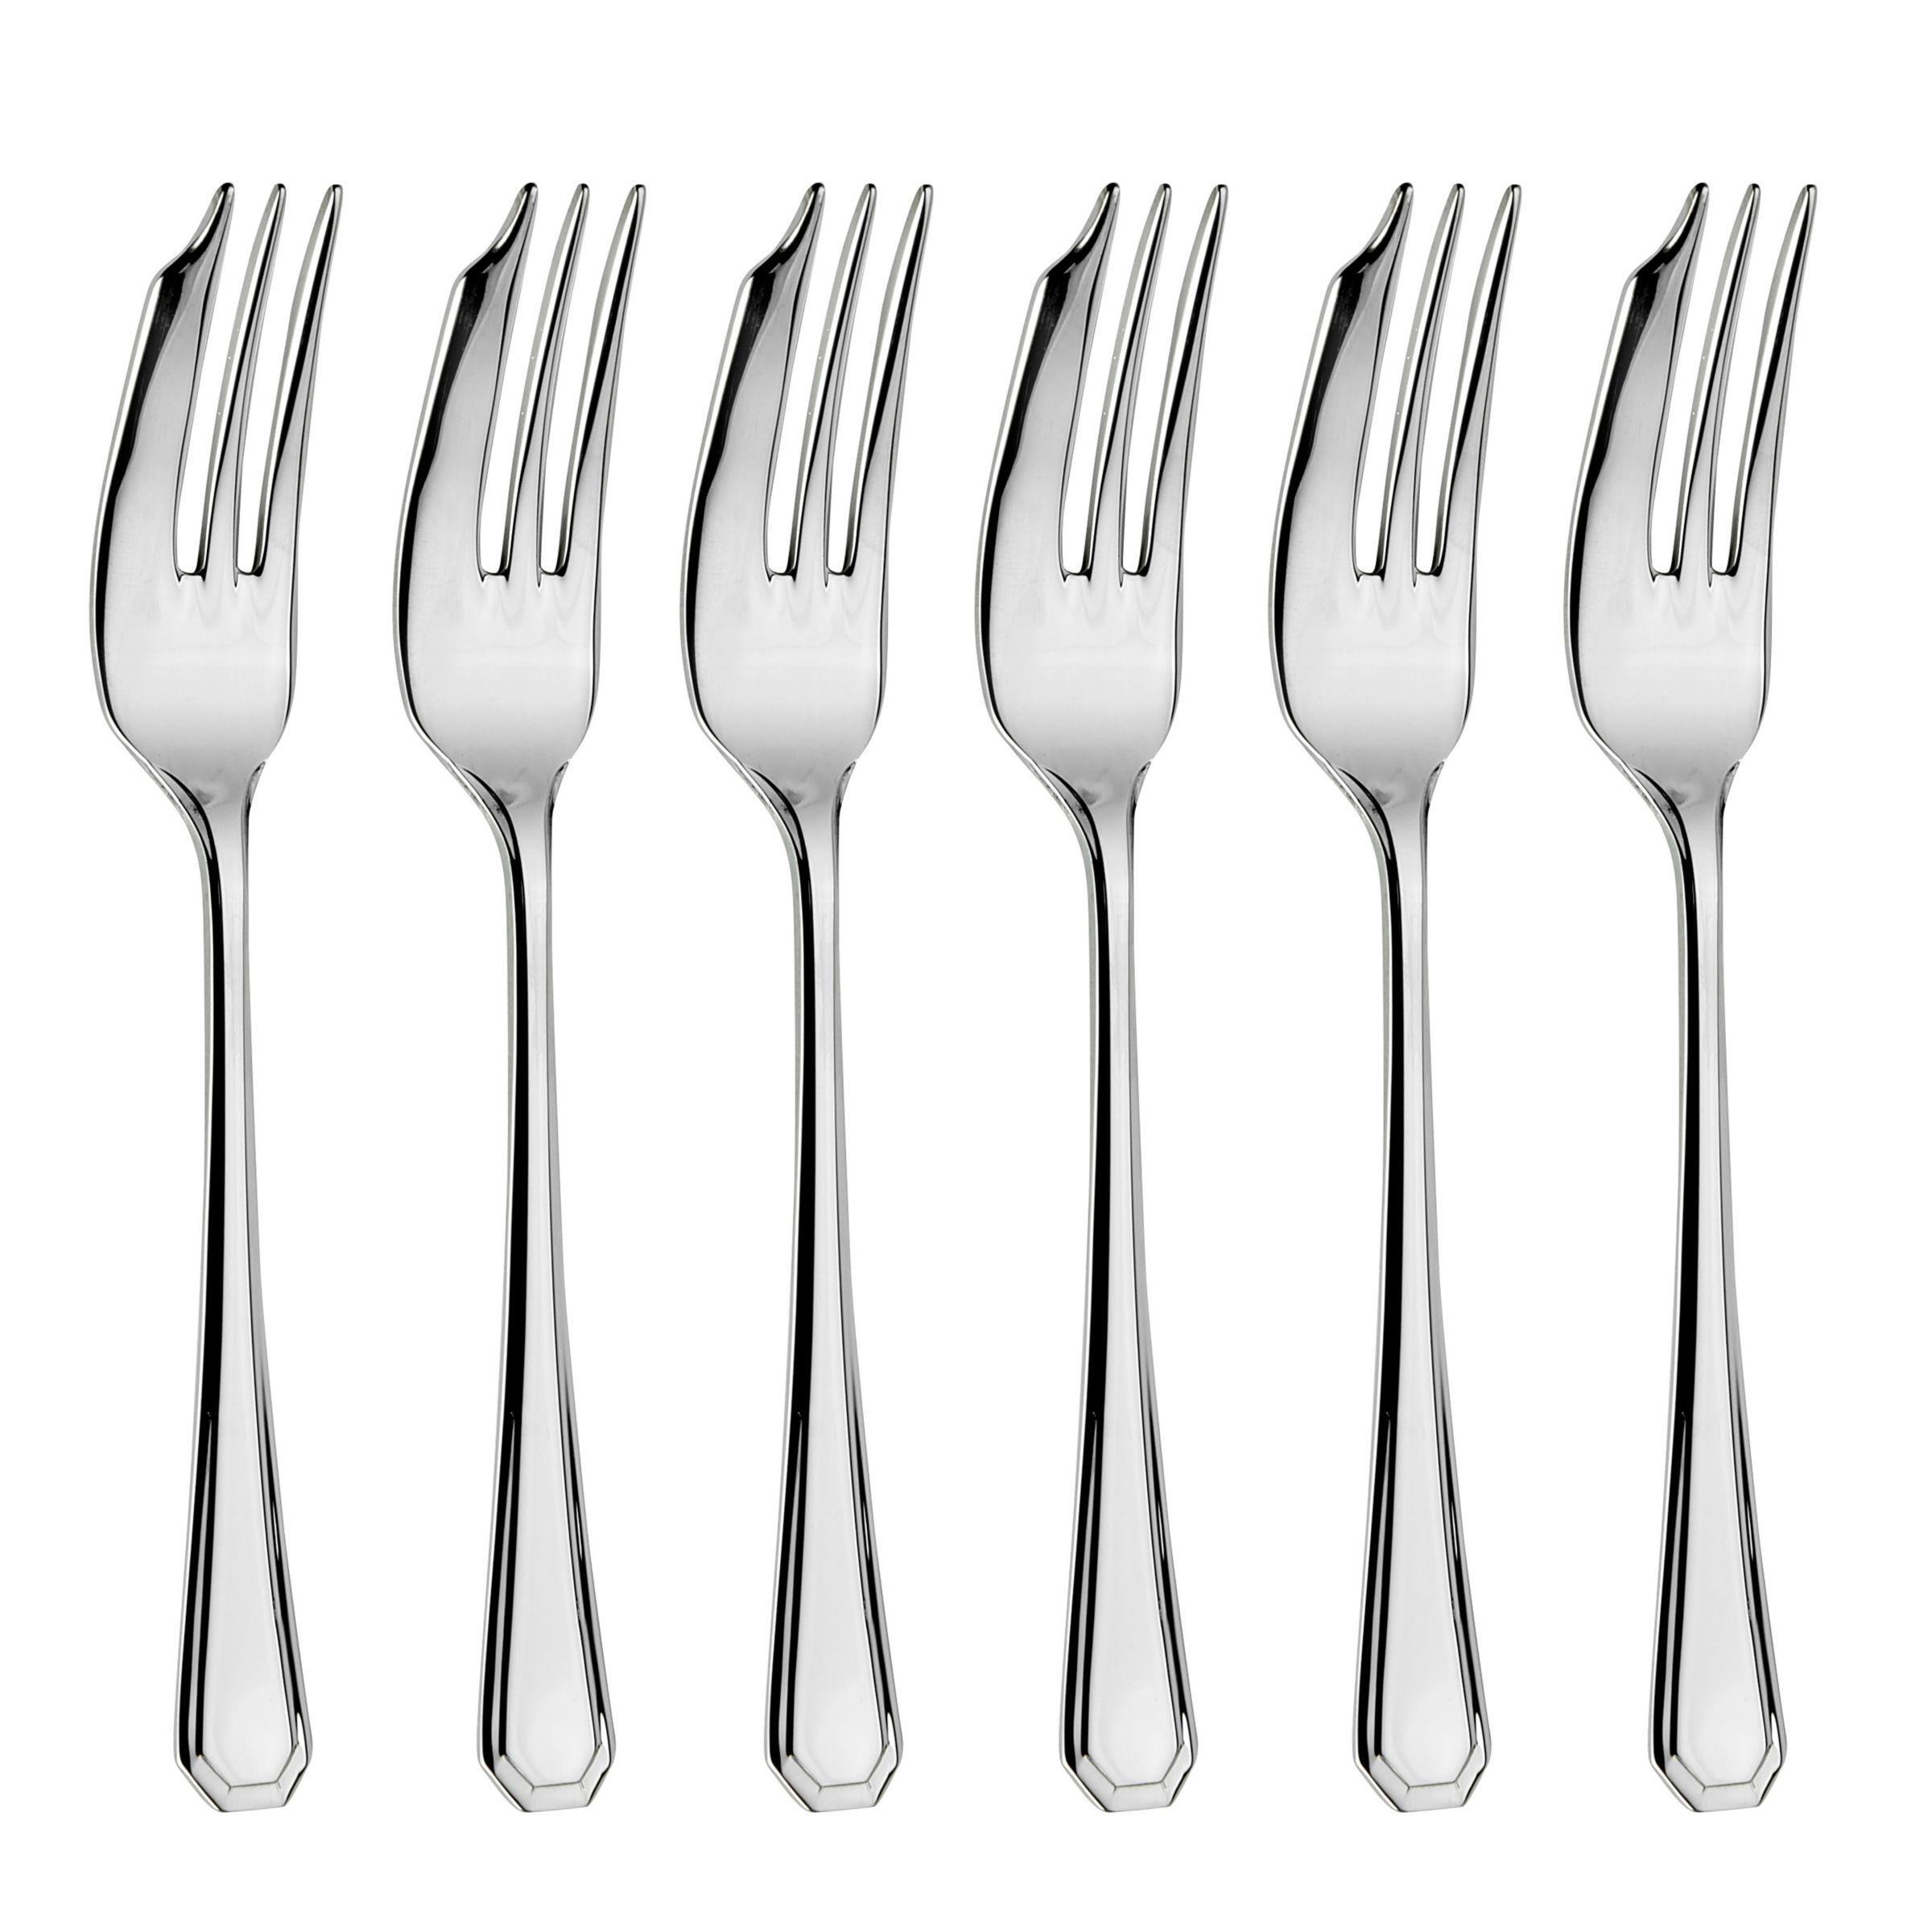 Arthur Price Arthur Price Grecian Pastry Forks, Set of 6